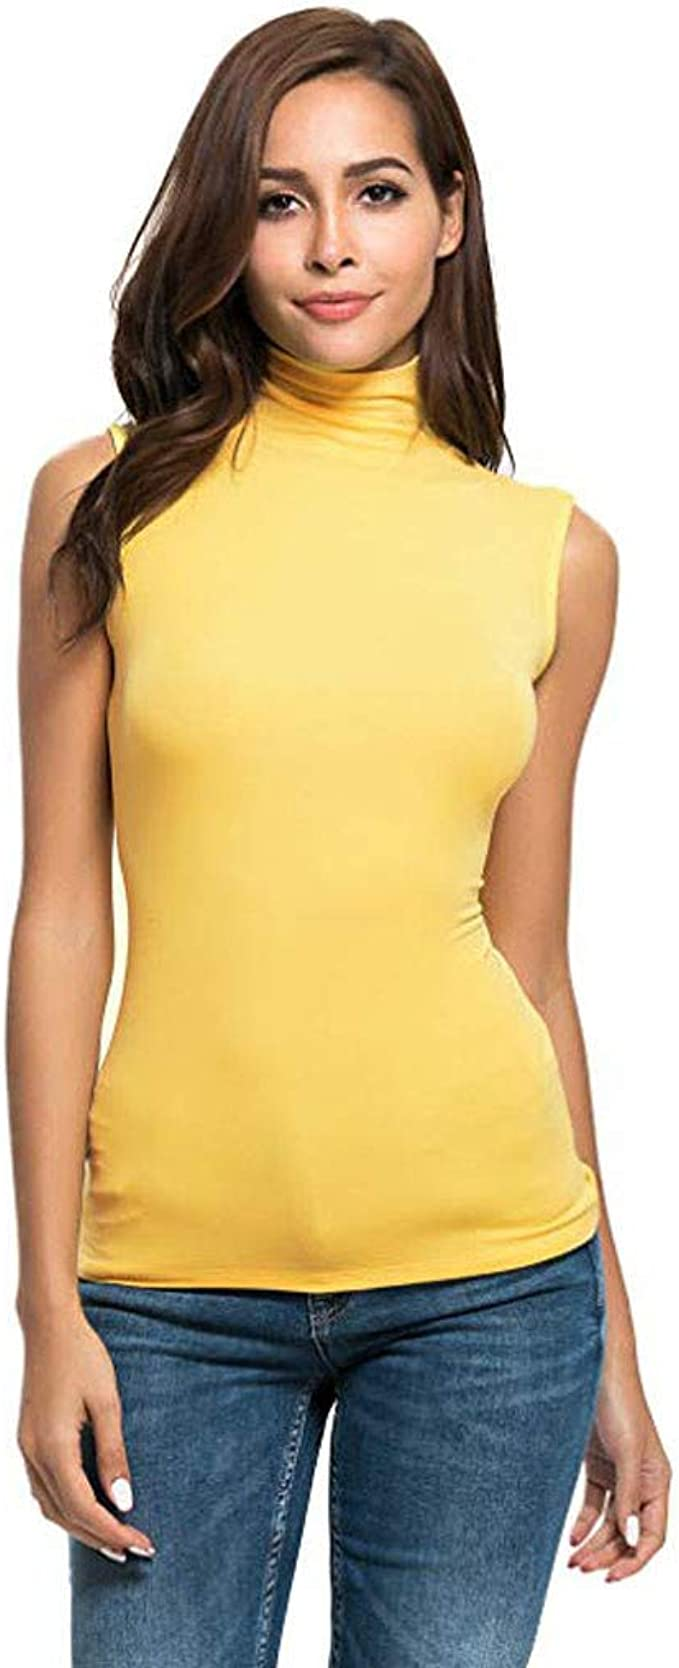 Mujer Camiseta Cuello Alto sin Mangas, Camiseta térmica Interior Basica Fiesta Tops Camiseta Tunic Camisa Casual Blusa: Amazon.es: Ropa y accesorios